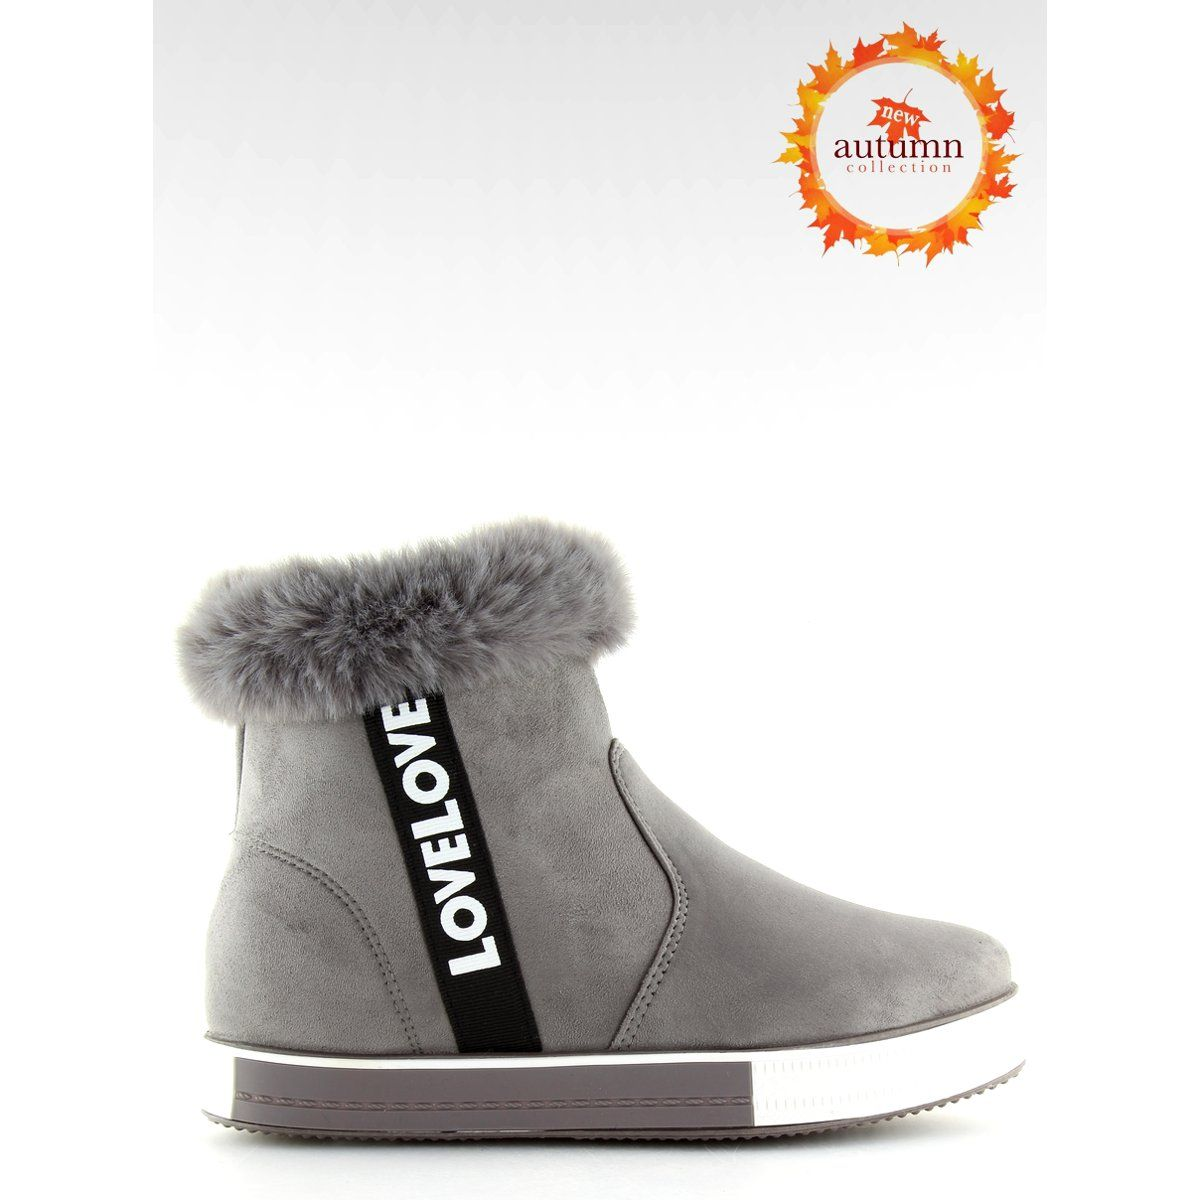 Trampki Za Kostke Ocieplane Szare Nb252p Boots Ugg Boots Fashion